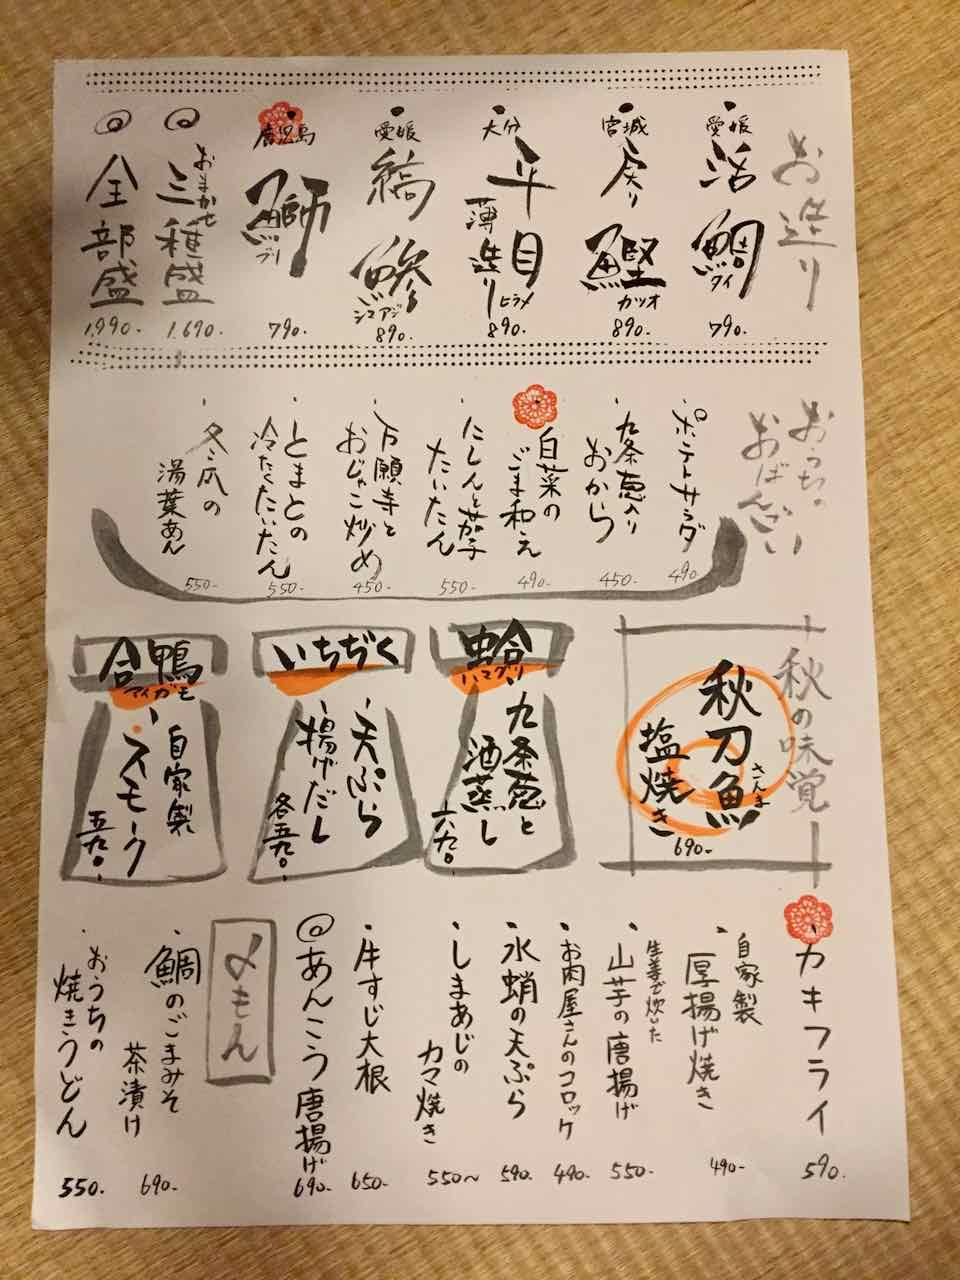 Hübsche Speisekarte – Restaurant 'Nakashimaya' Kyoto